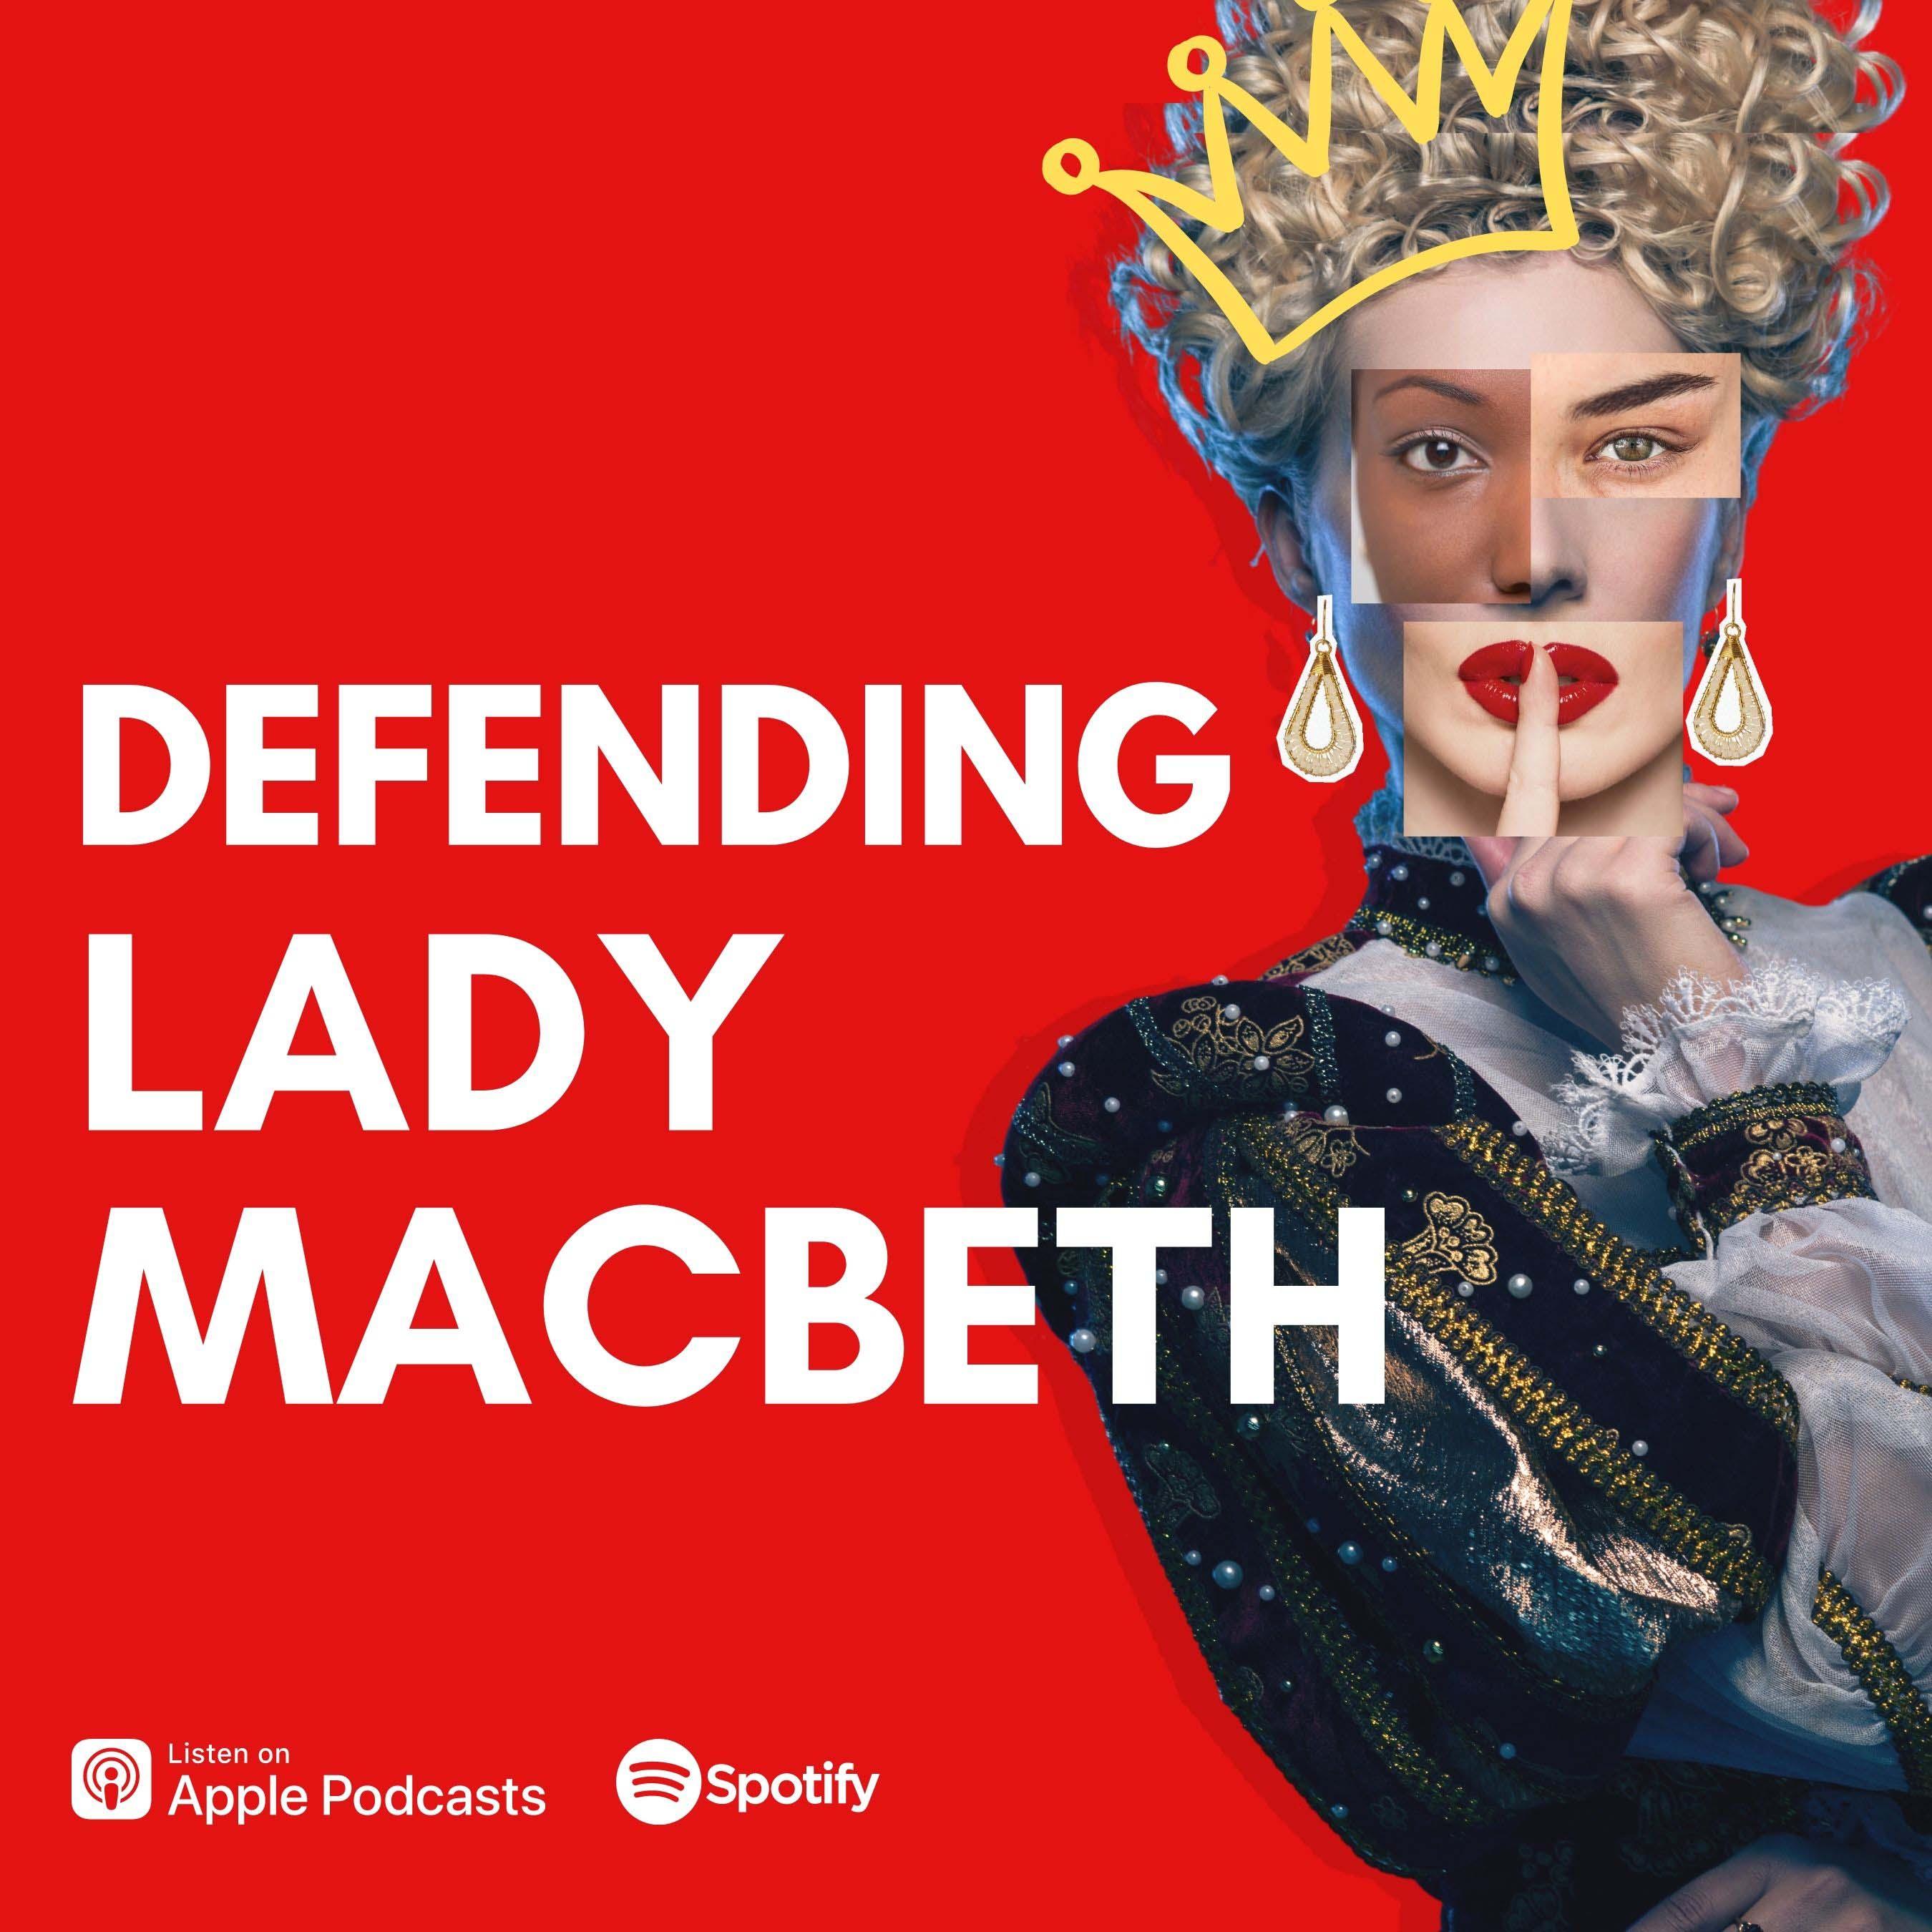 Defending Lady Macbeth